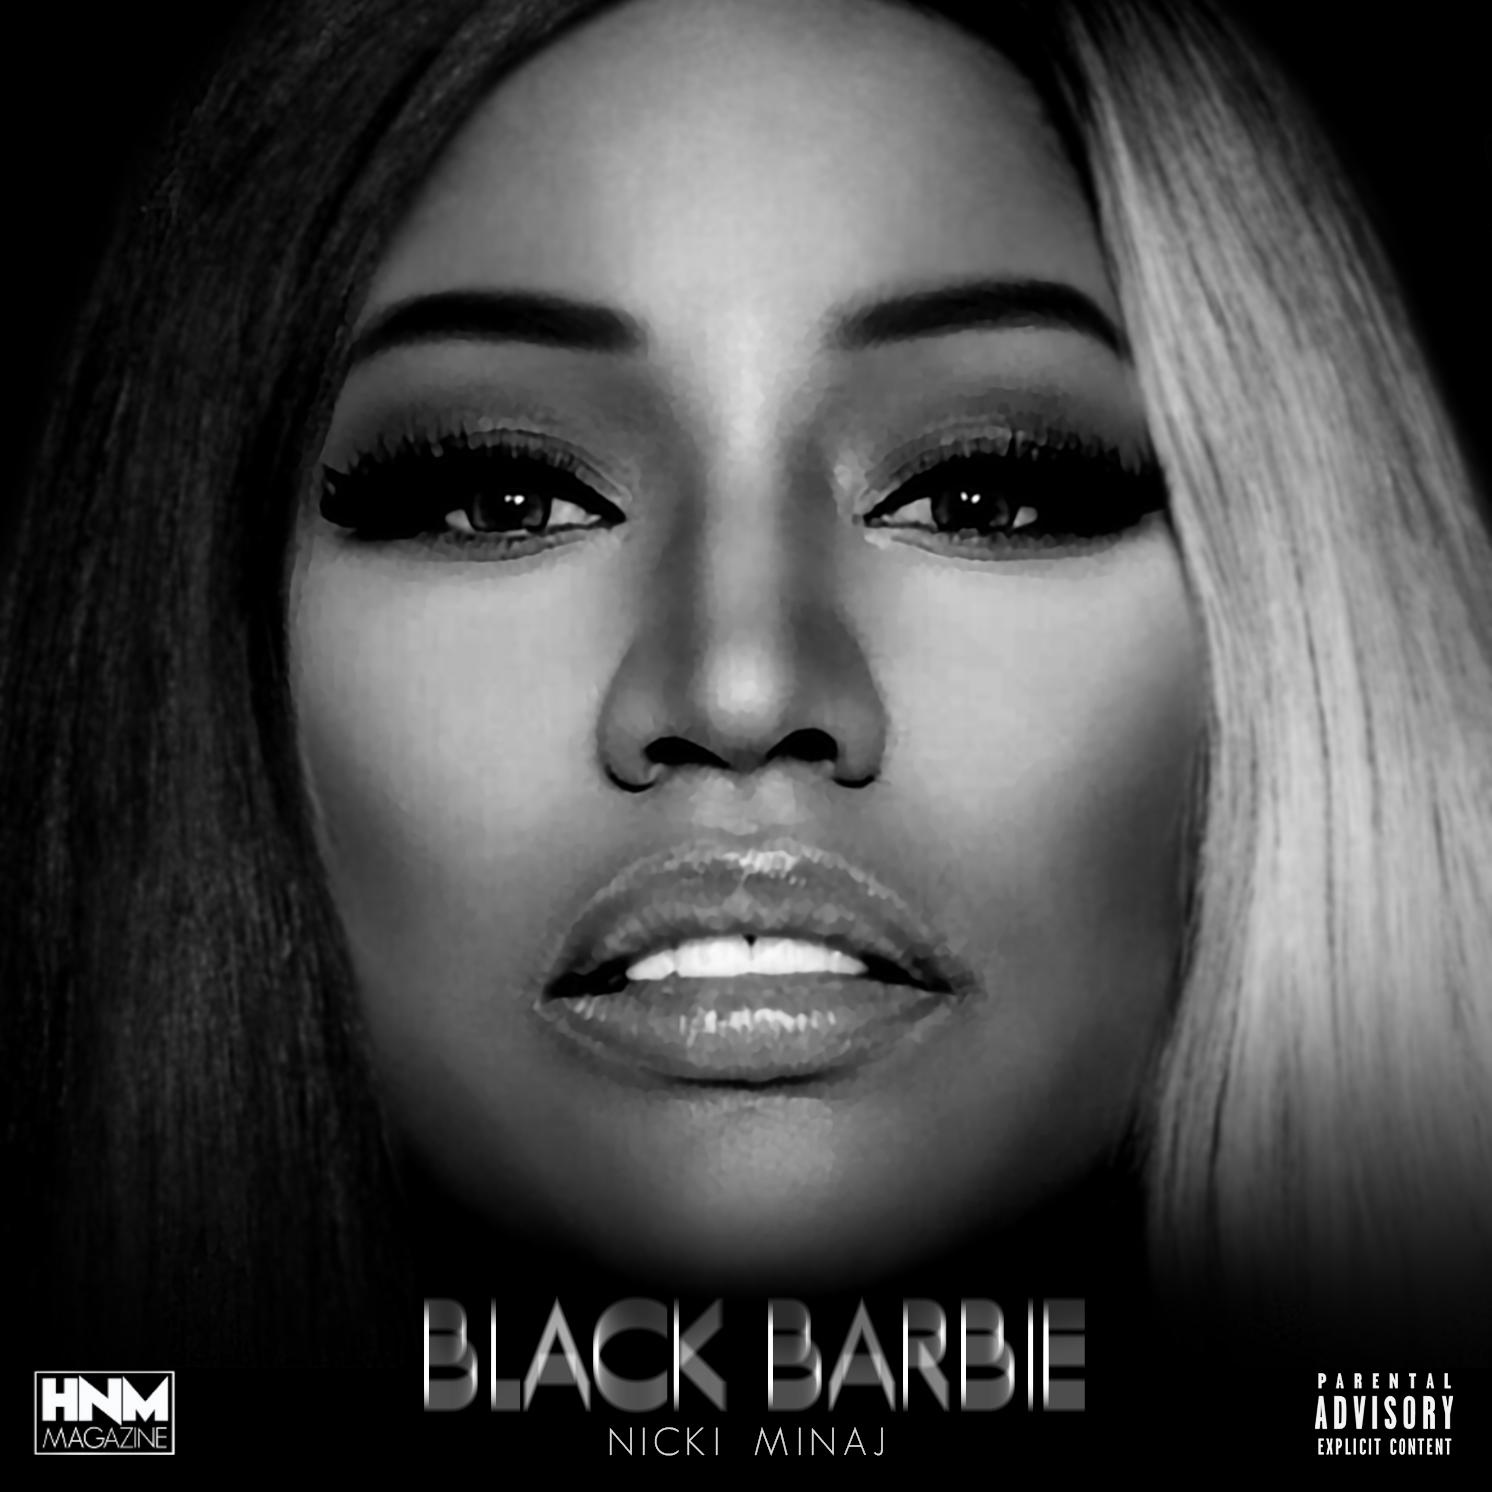 finaleblackbarbie?w=1100 black barbie [mixtape] hnm magazine